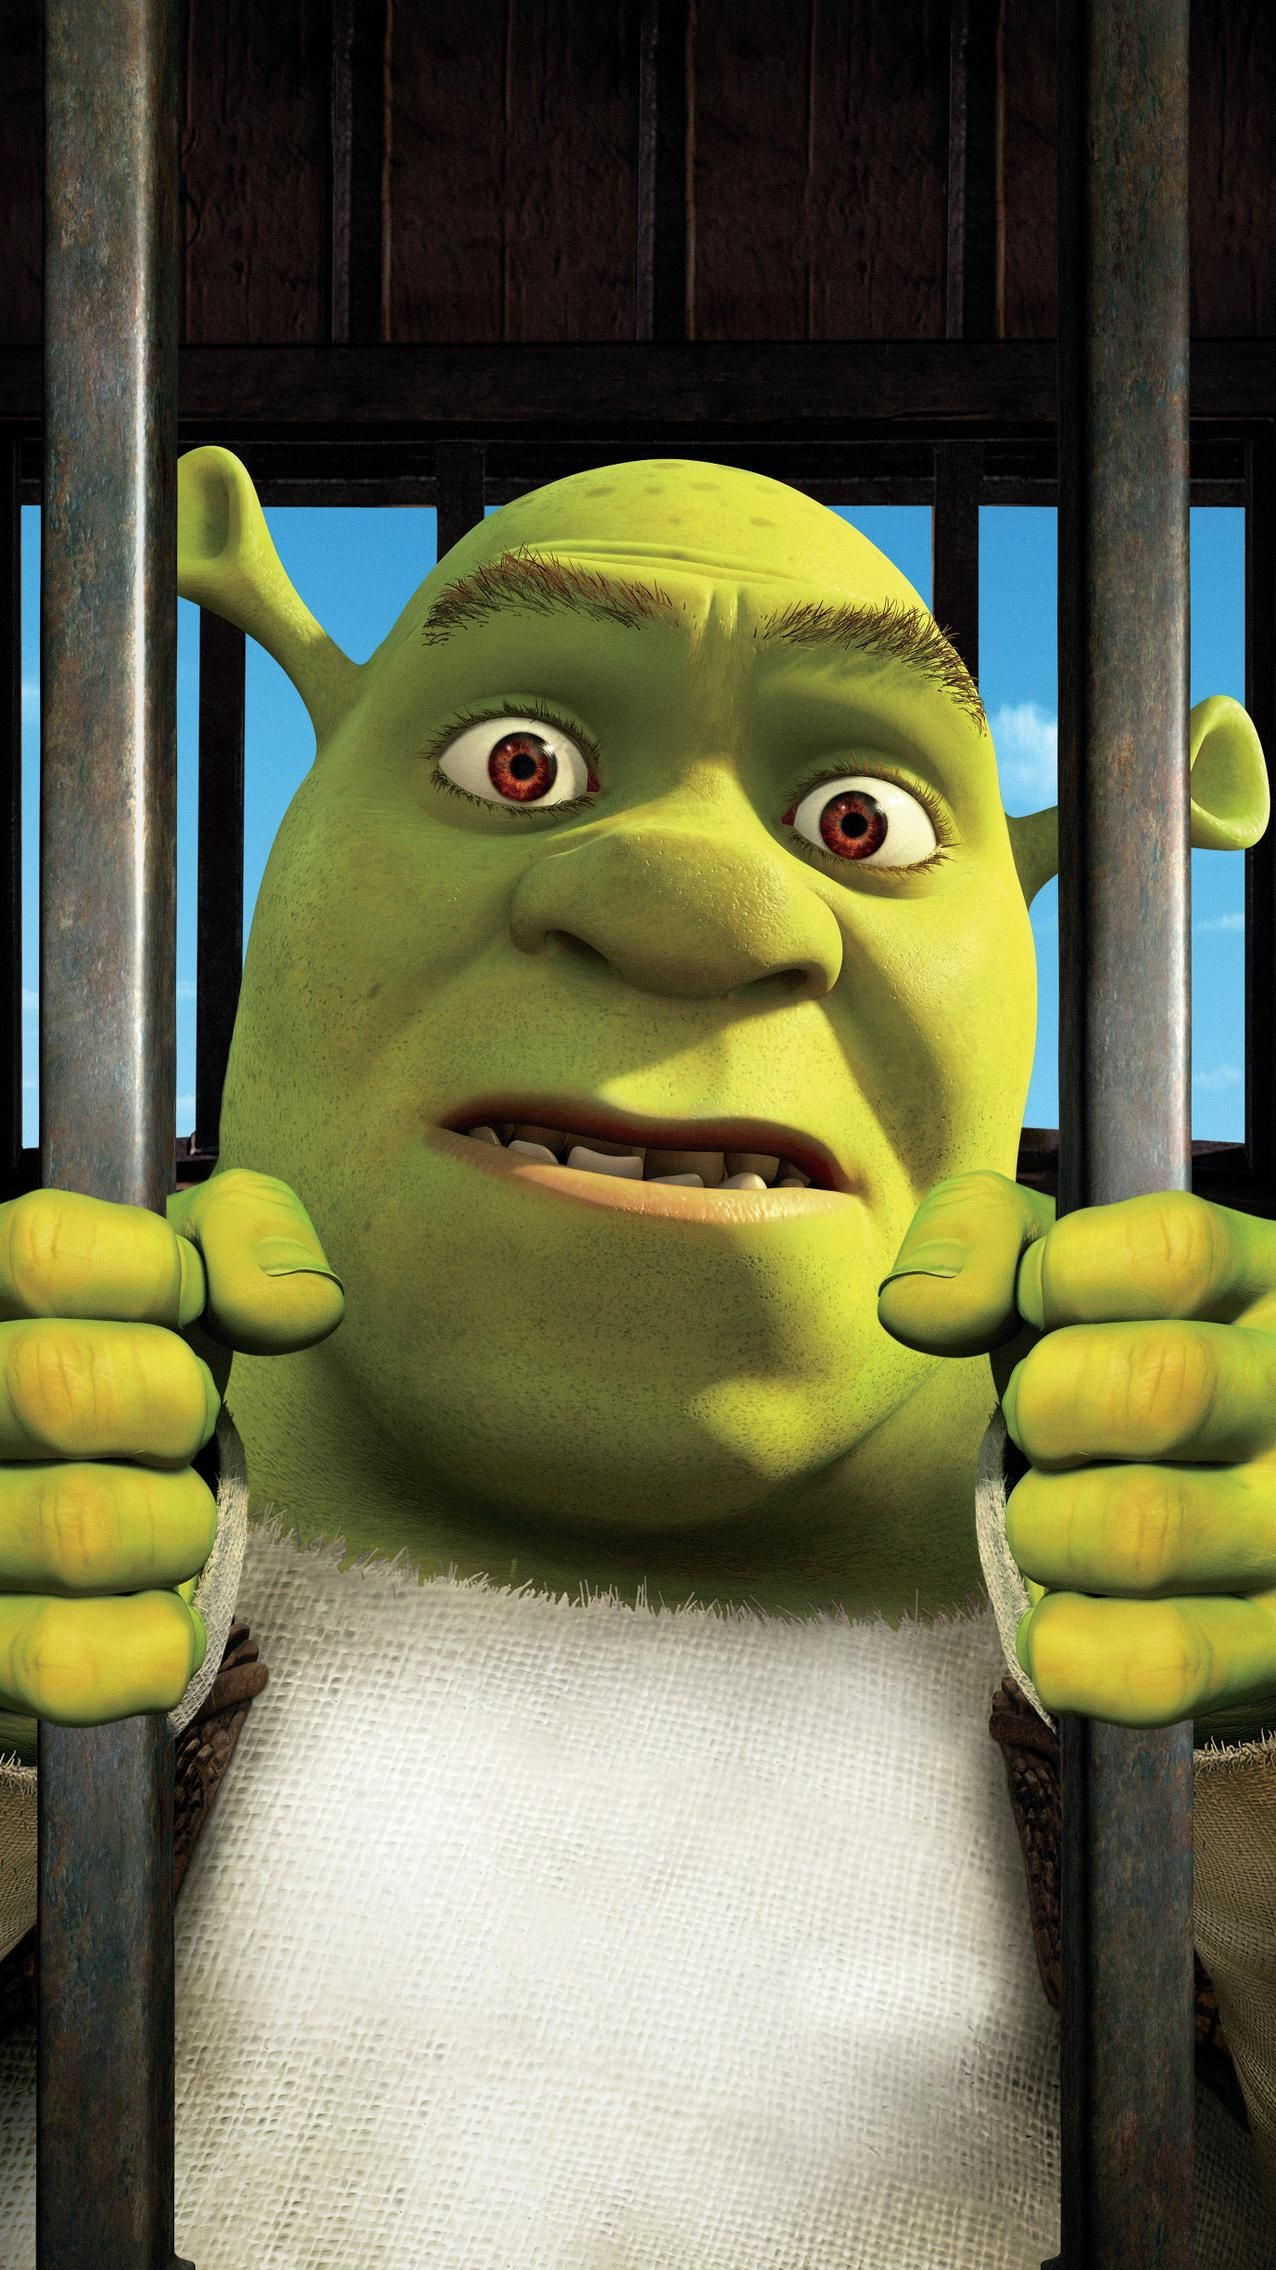 Shrek Forever After (2010) Phone Wallpaper, 2020 Mutlu